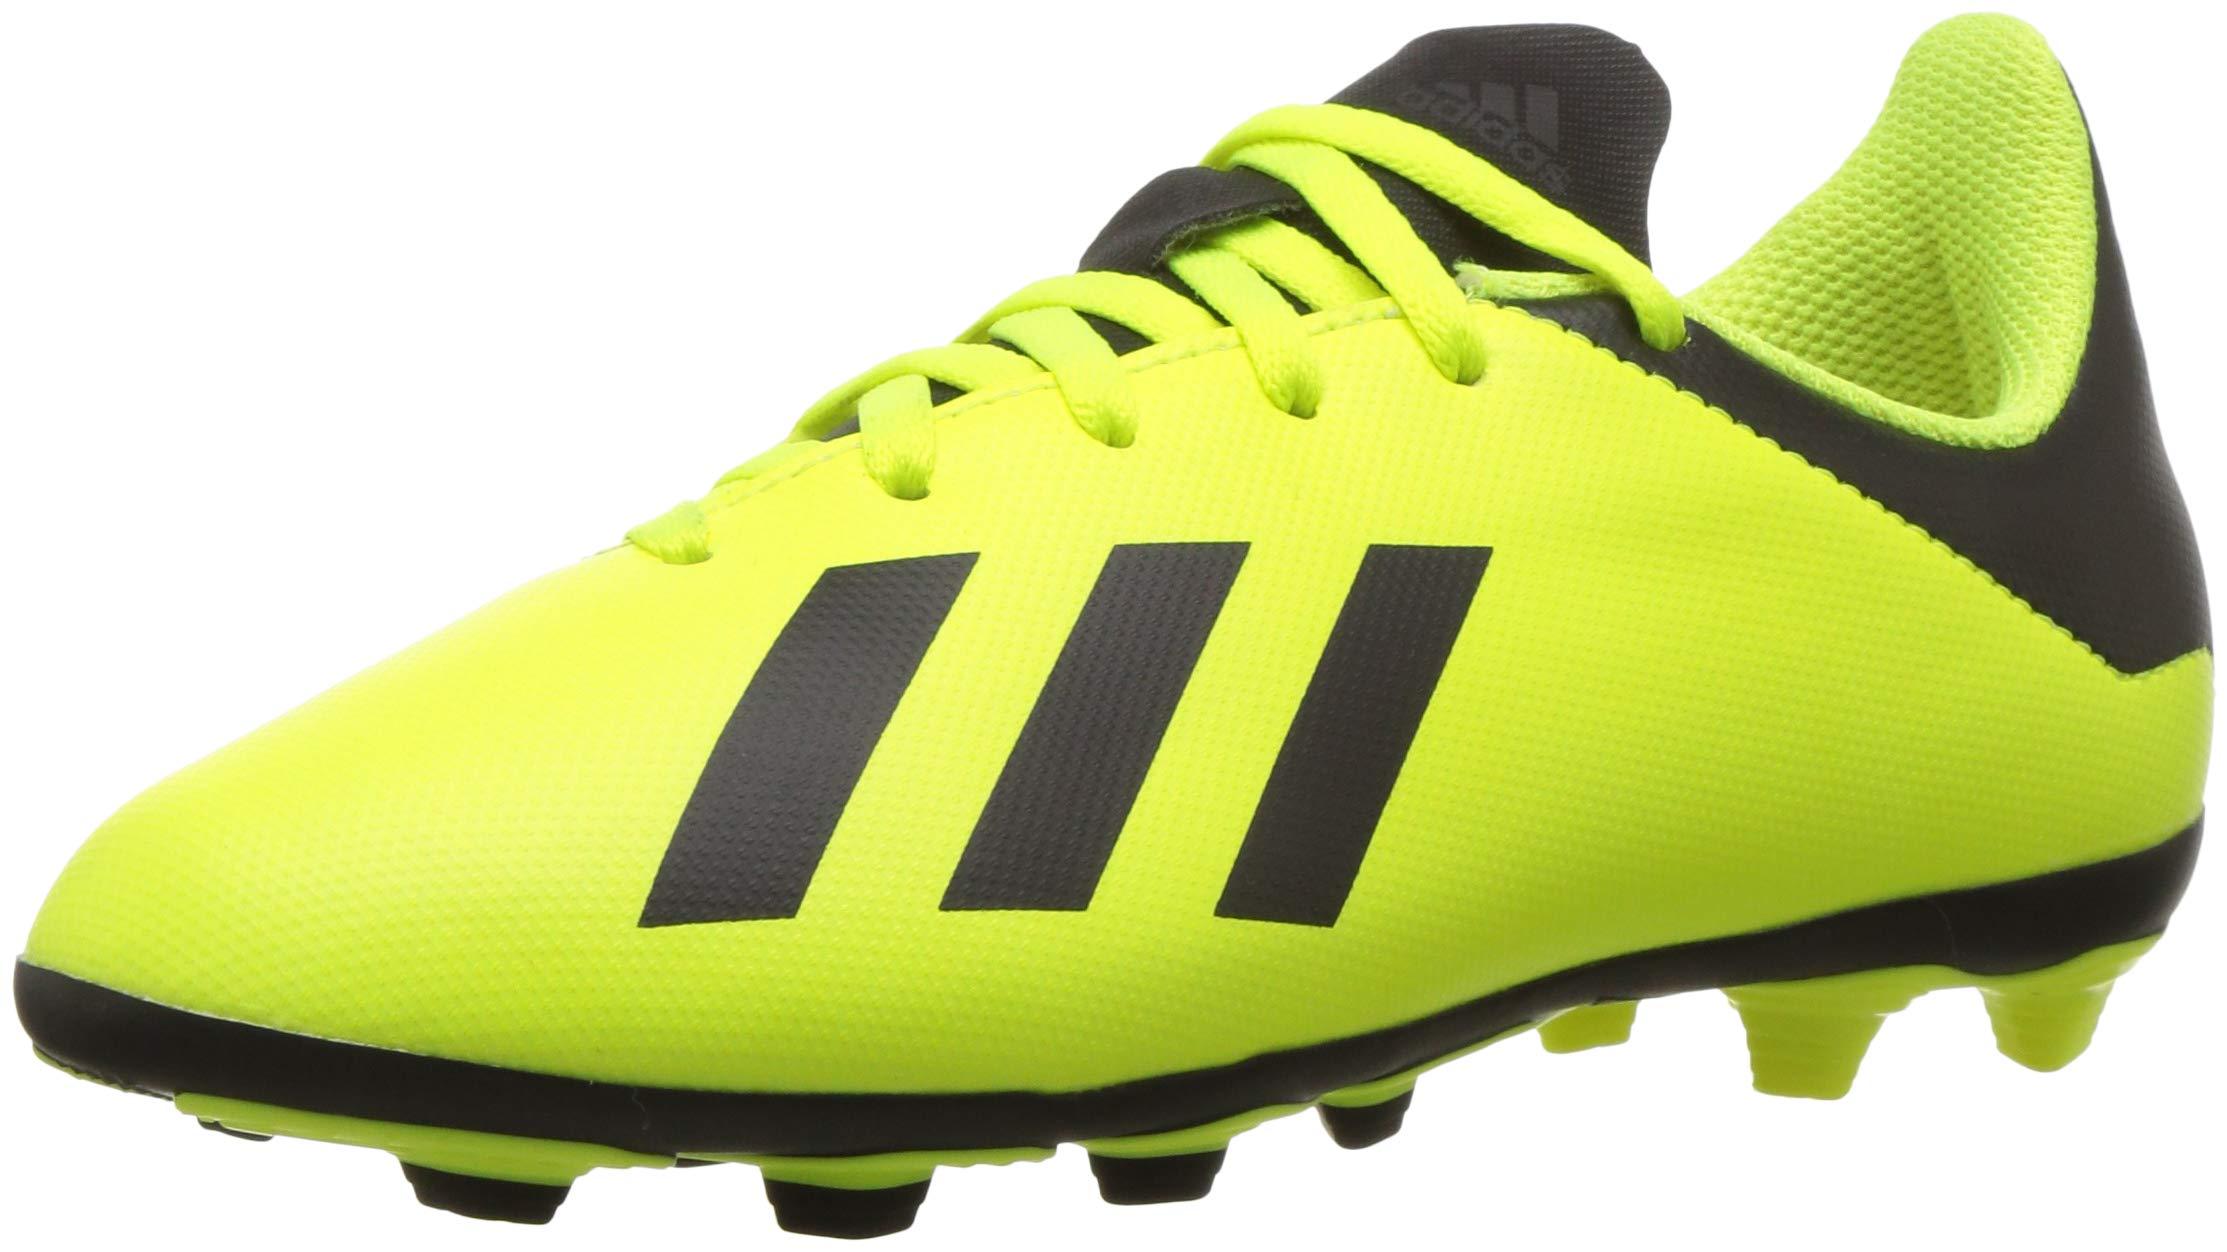 adidas Unisex X 18.4 Firm Ground Soccer Shoe, Black/Solar Yellow, 2 M US Little Kid